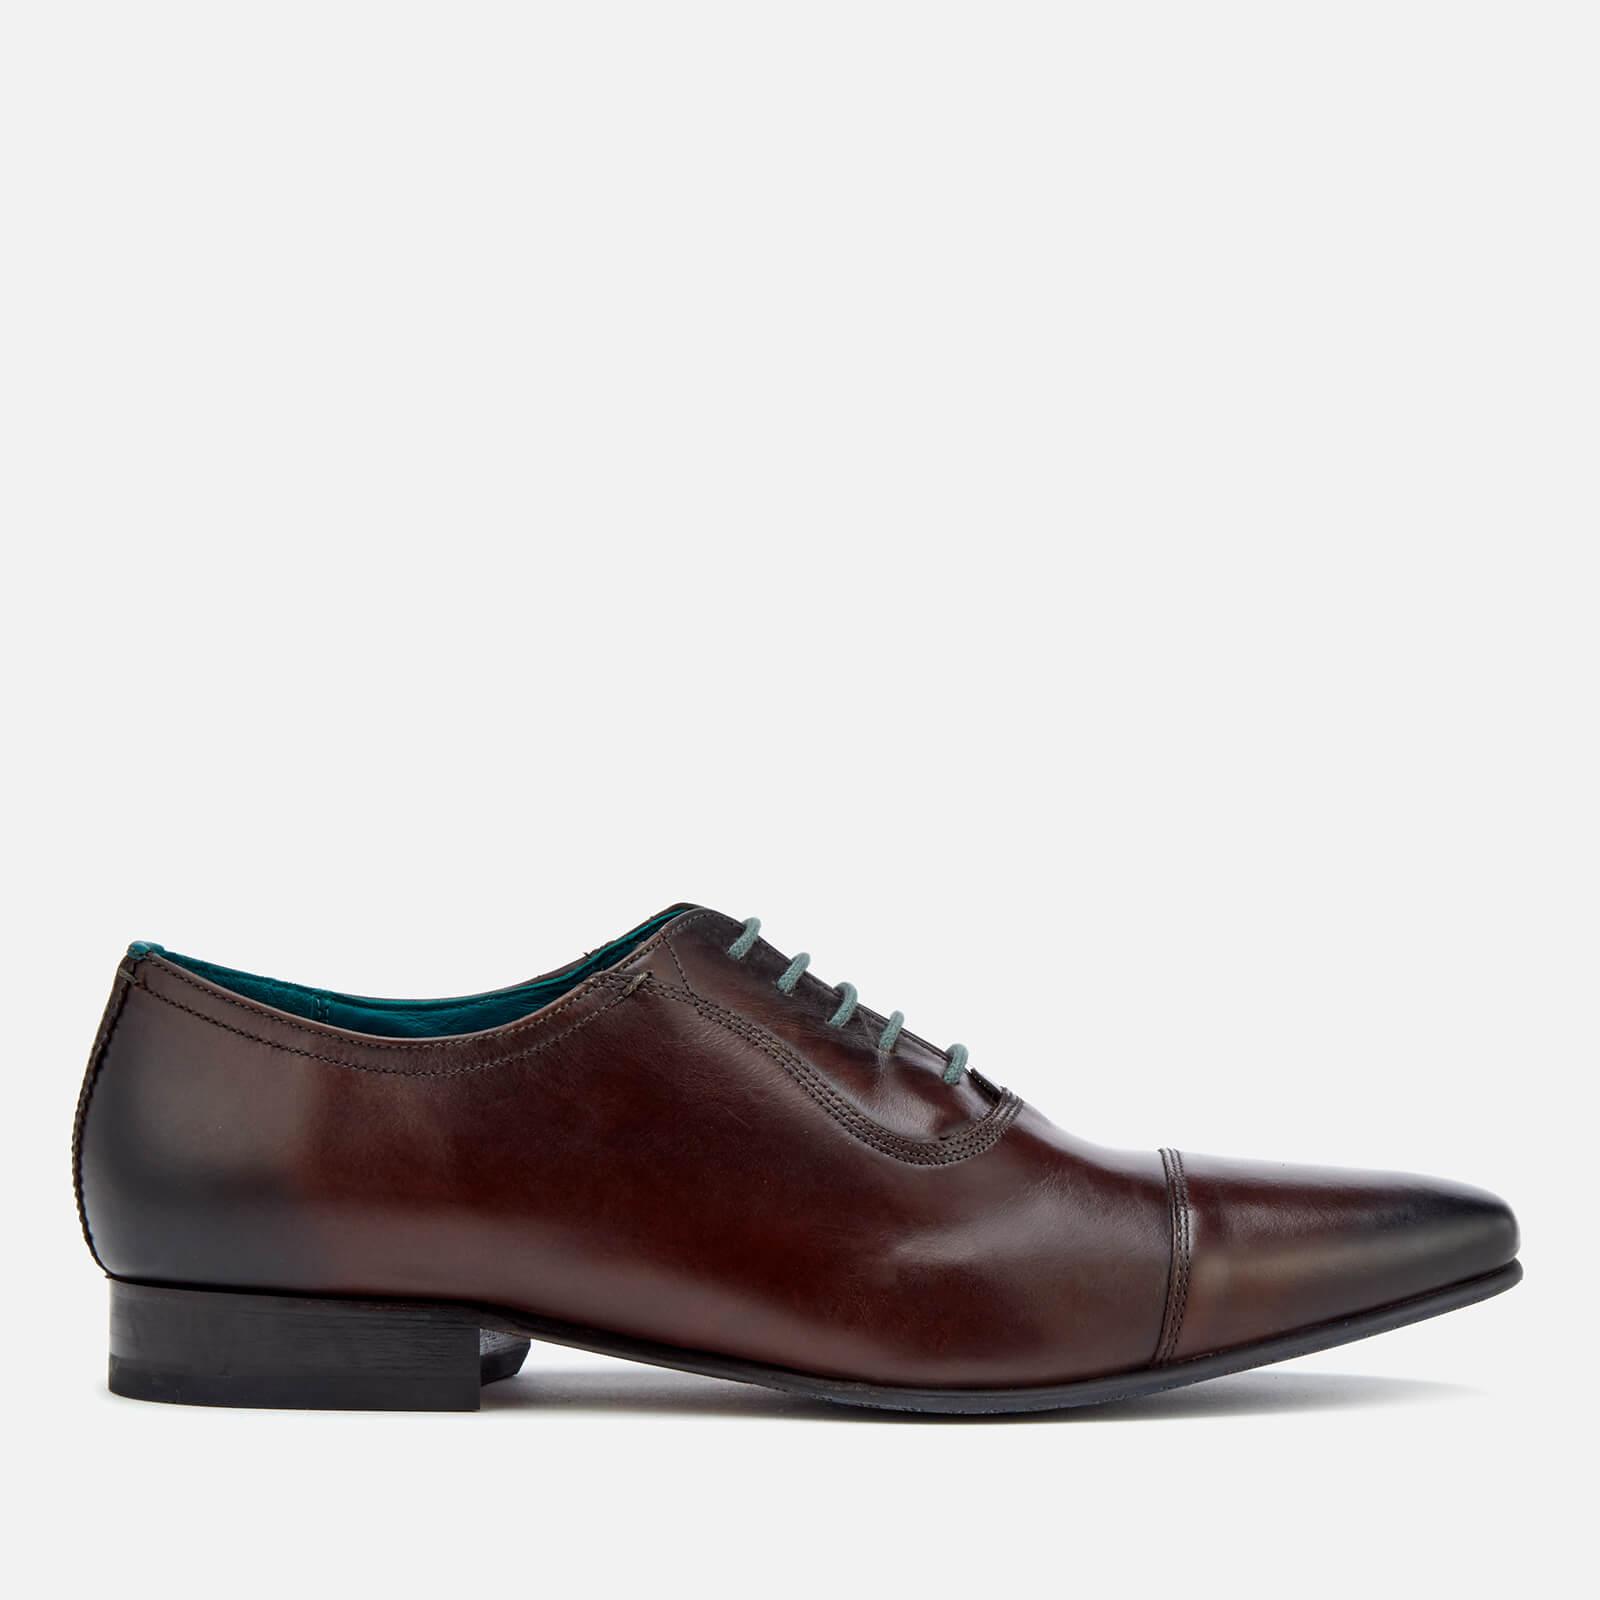 Ted Baker Men's Karney Leather Toe-Cap Oxford Shoes - Brown - UK 11